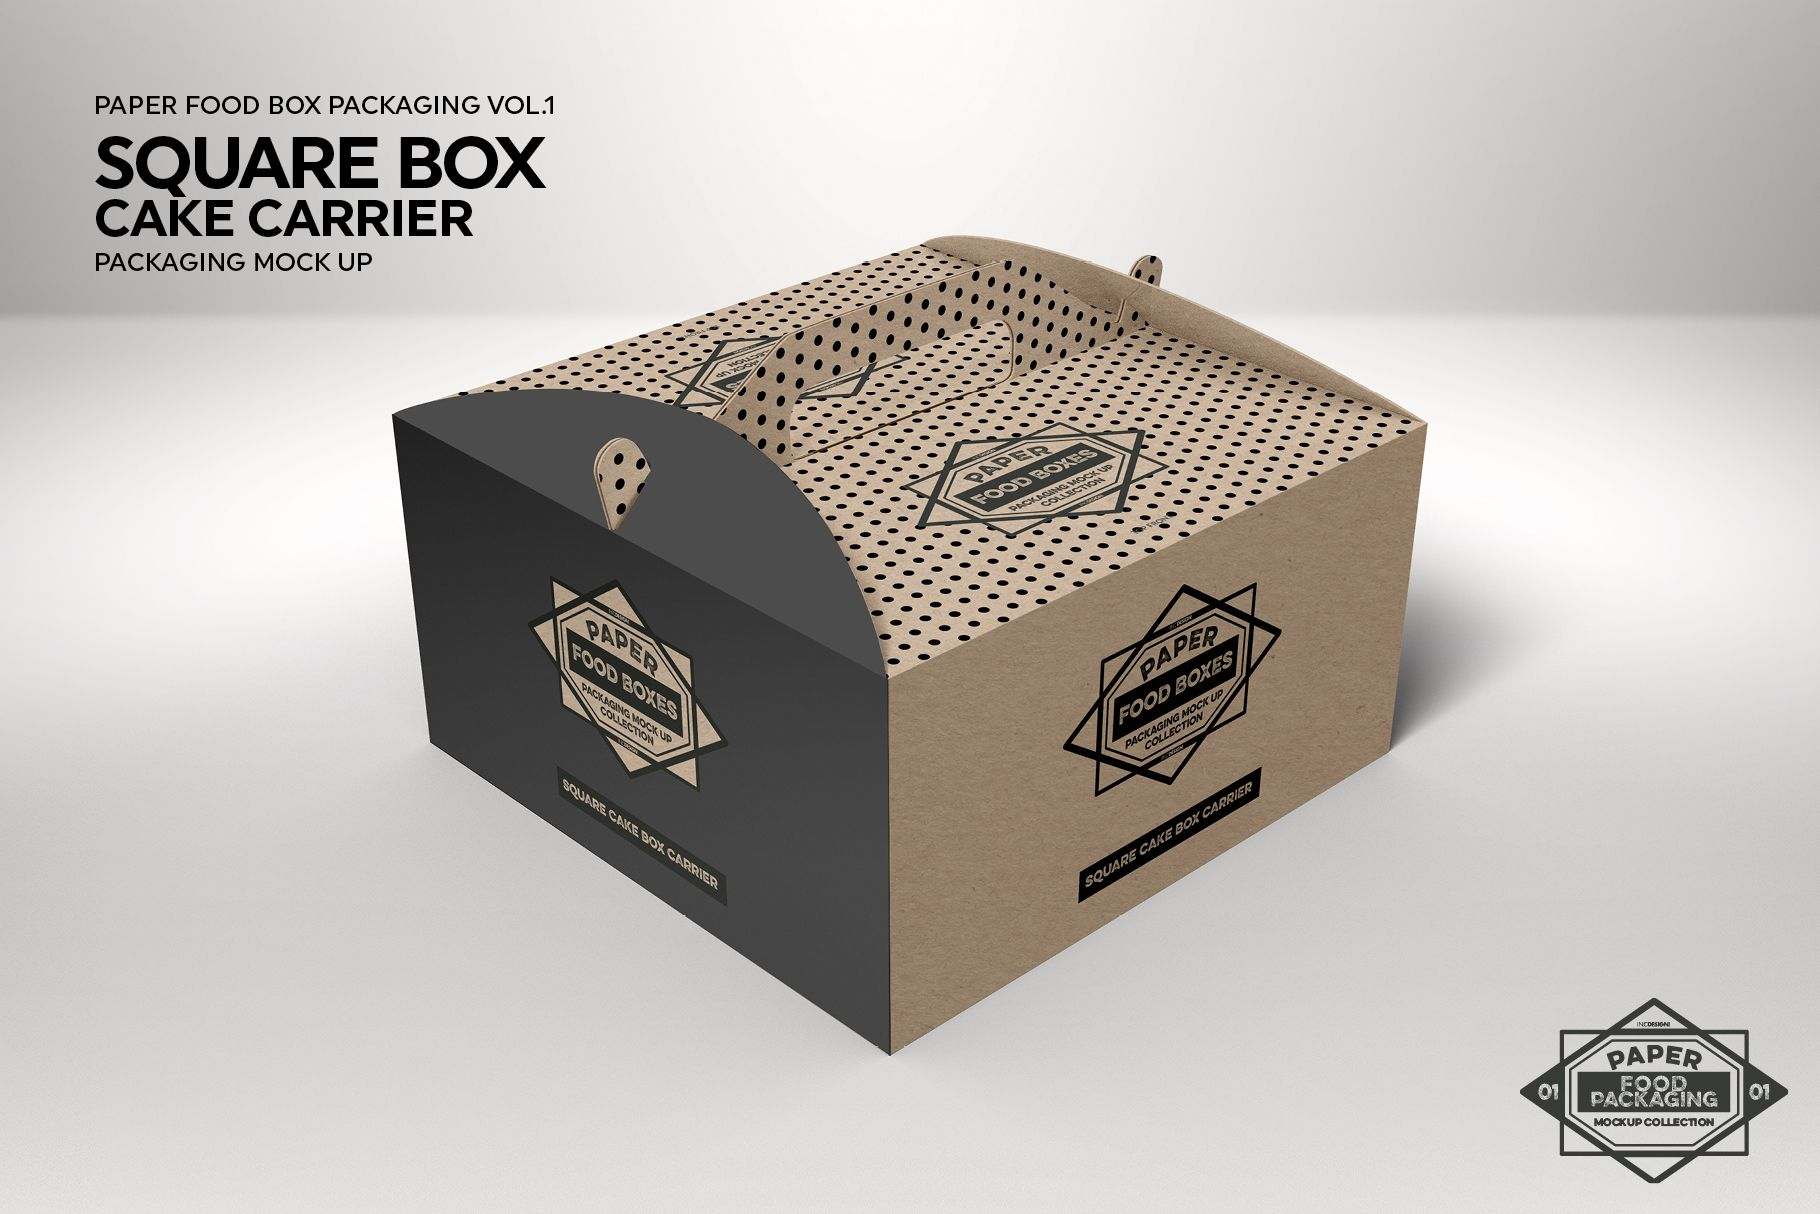 Download Vol 1 Food Box Packaging Mockups 64683 Branding Design Bundles Free Packaging Mockup Design Mockup Free Packaging Mockup